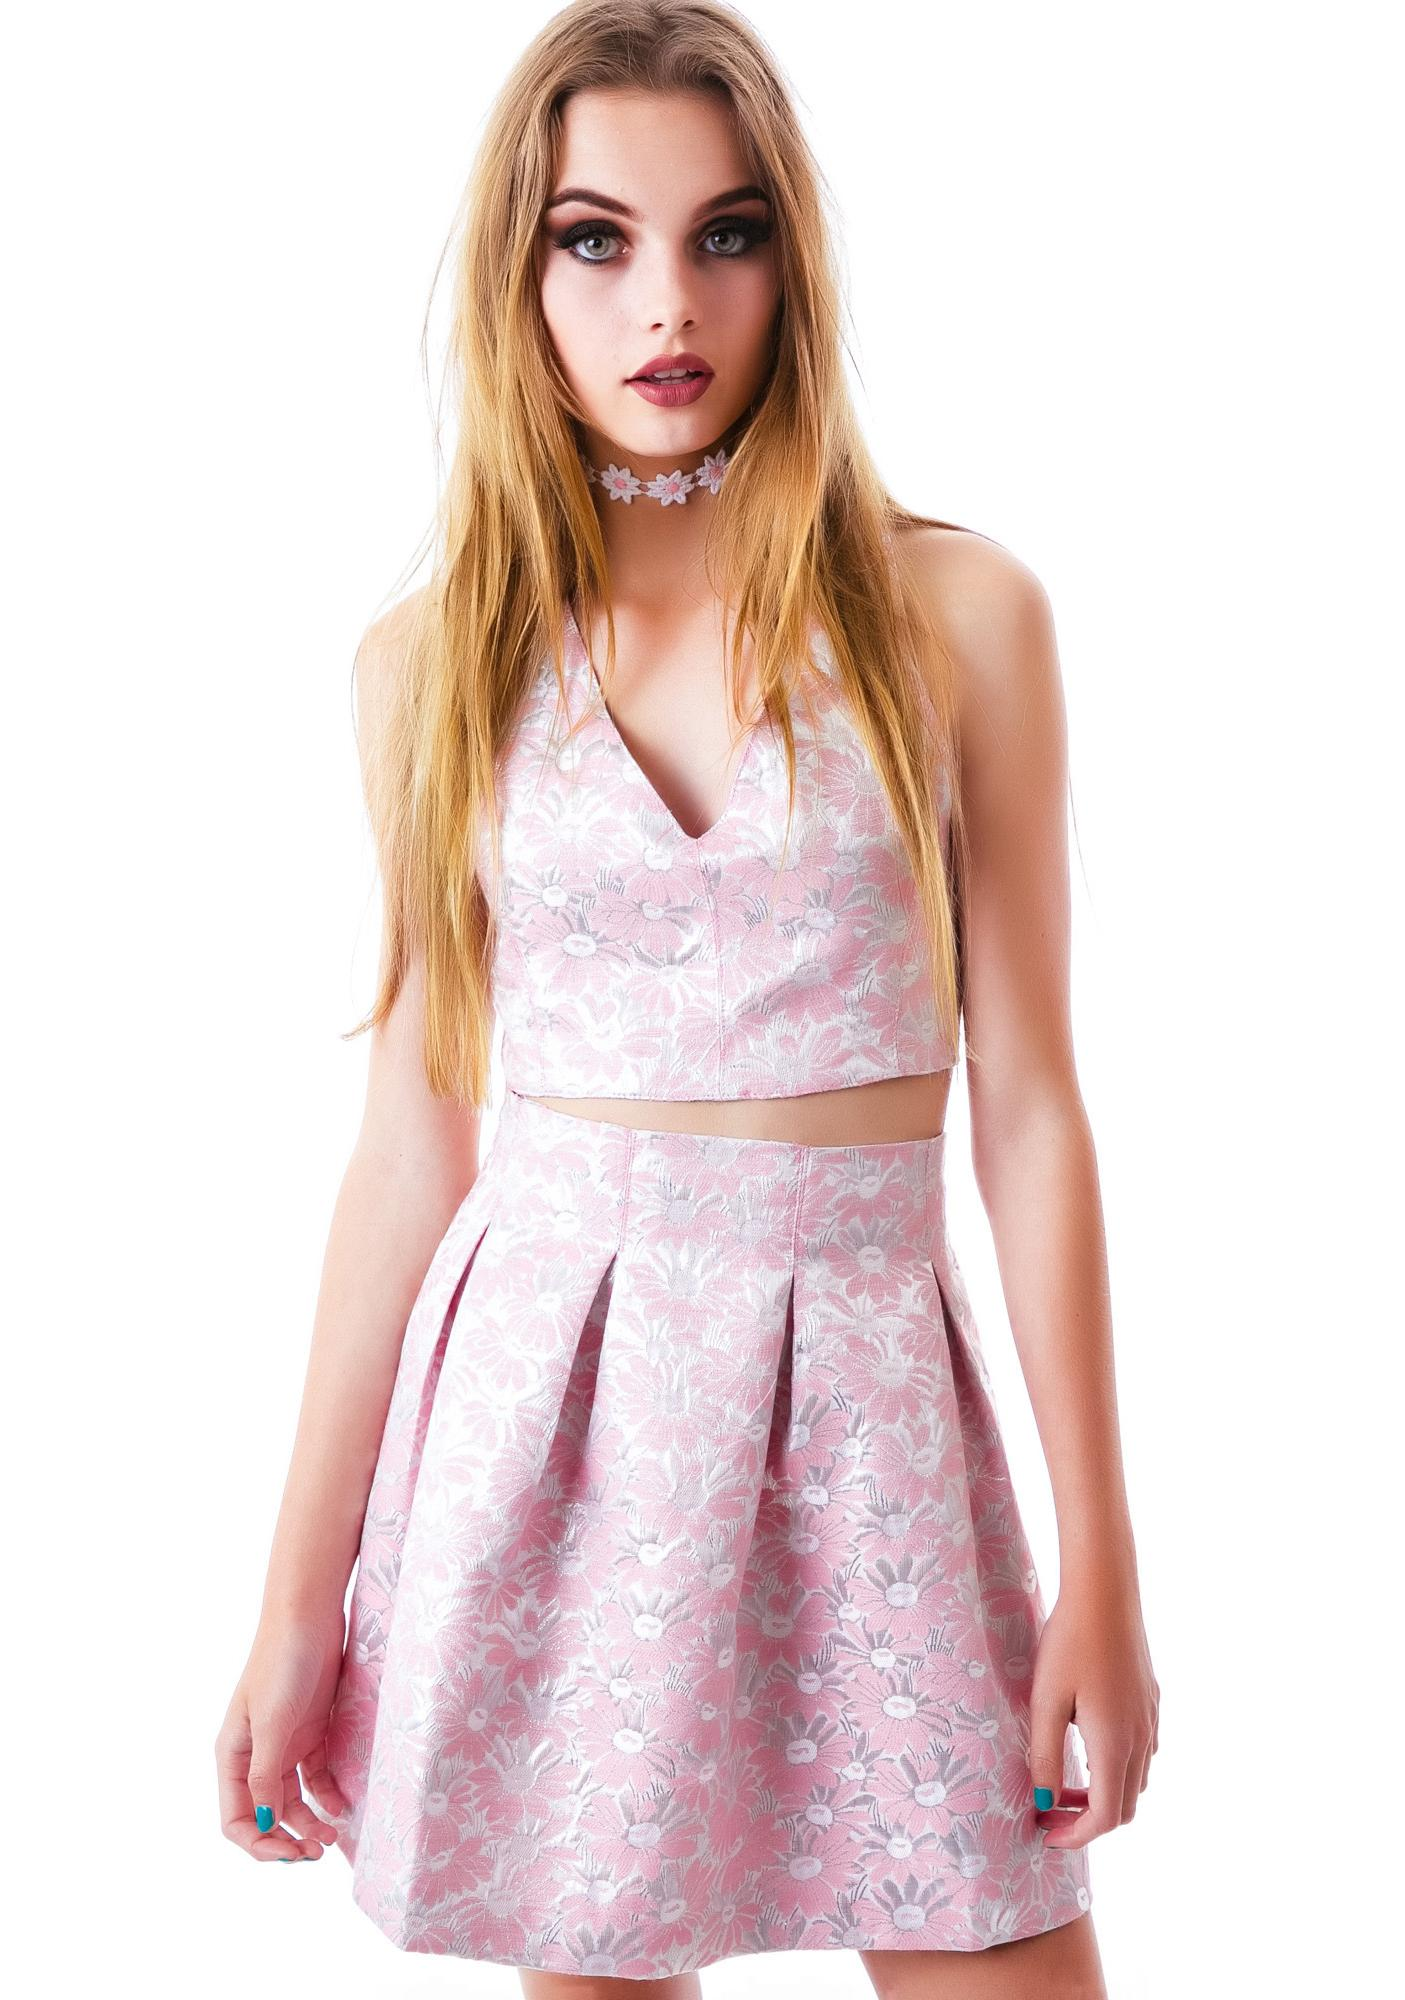 Darling Daisy Shiny Skirt